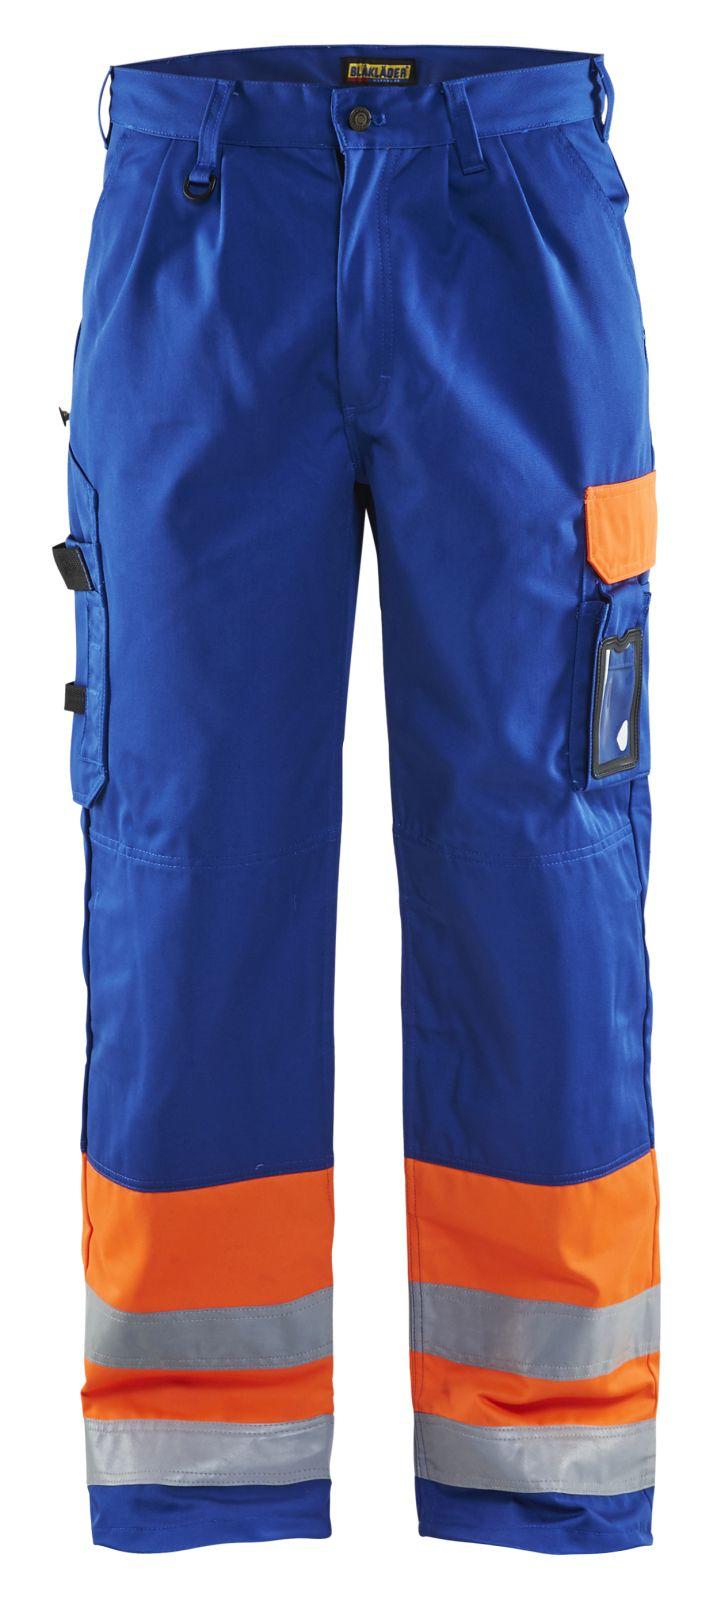 Blaklader Werkbroeken 15841860 High Vis oranje-korenblauw(5385)